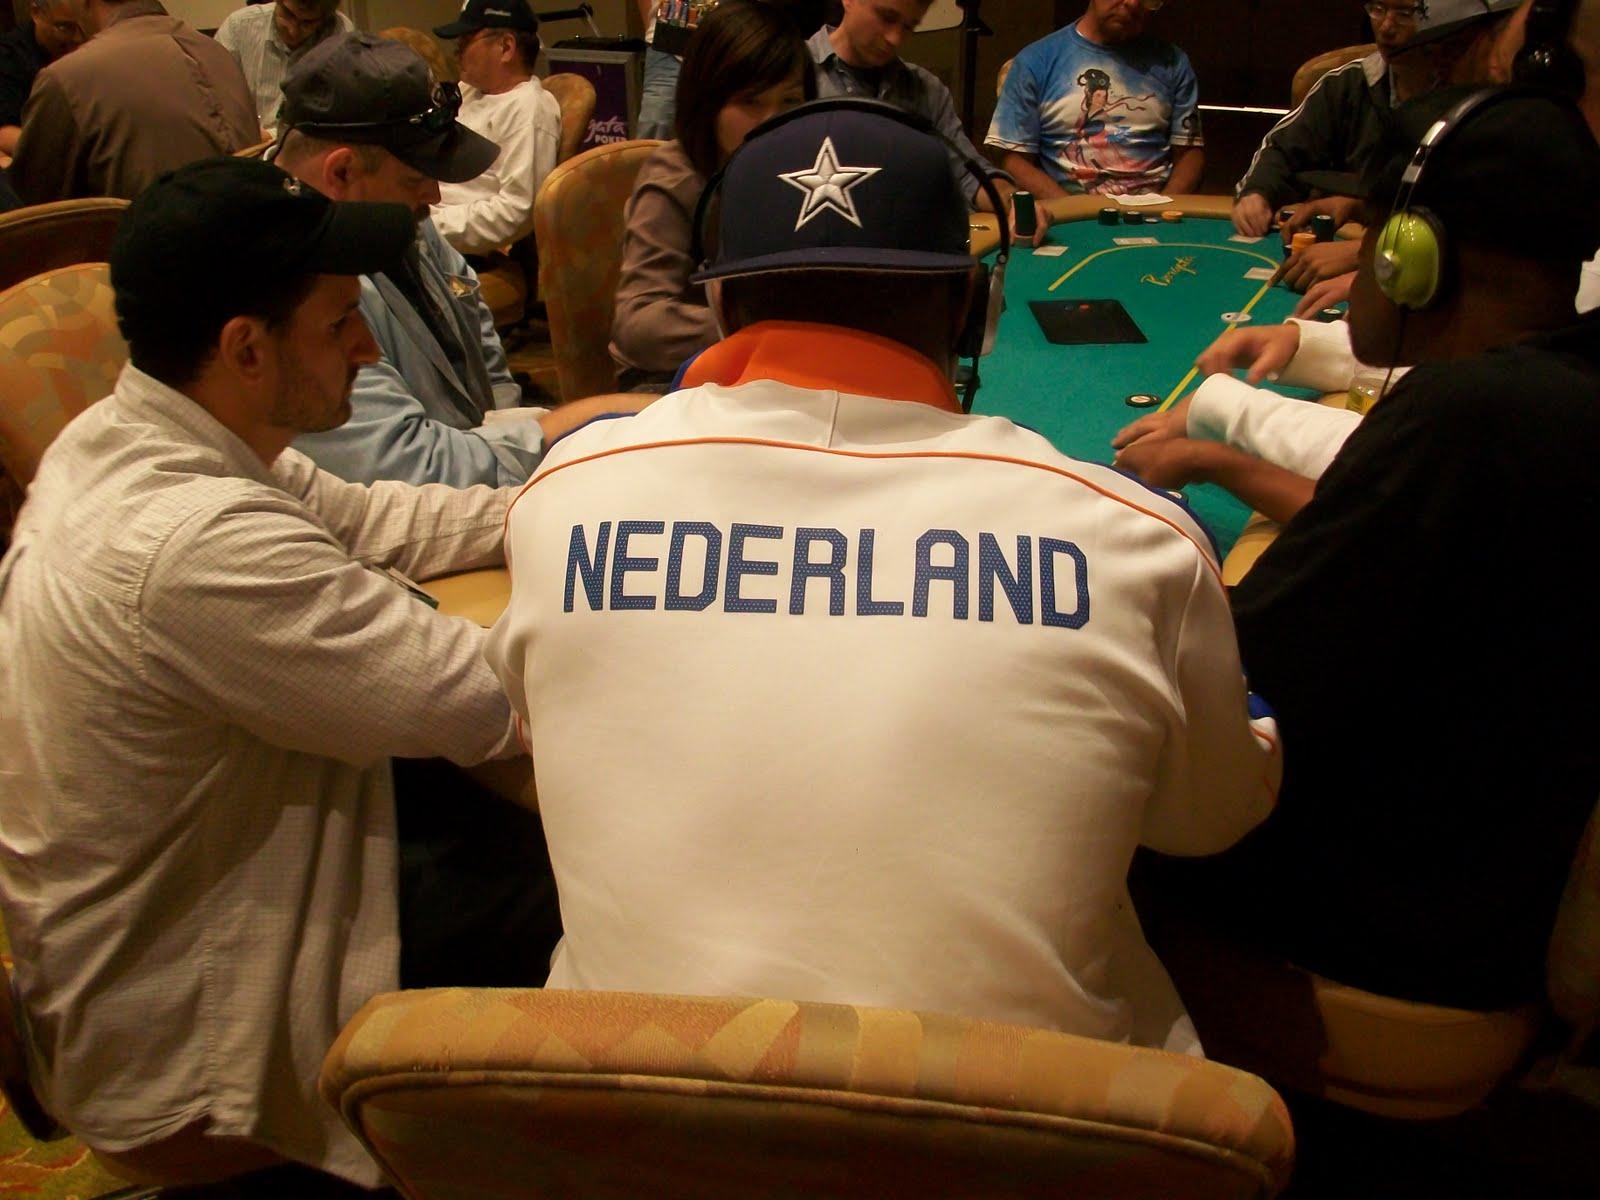 Poker chase